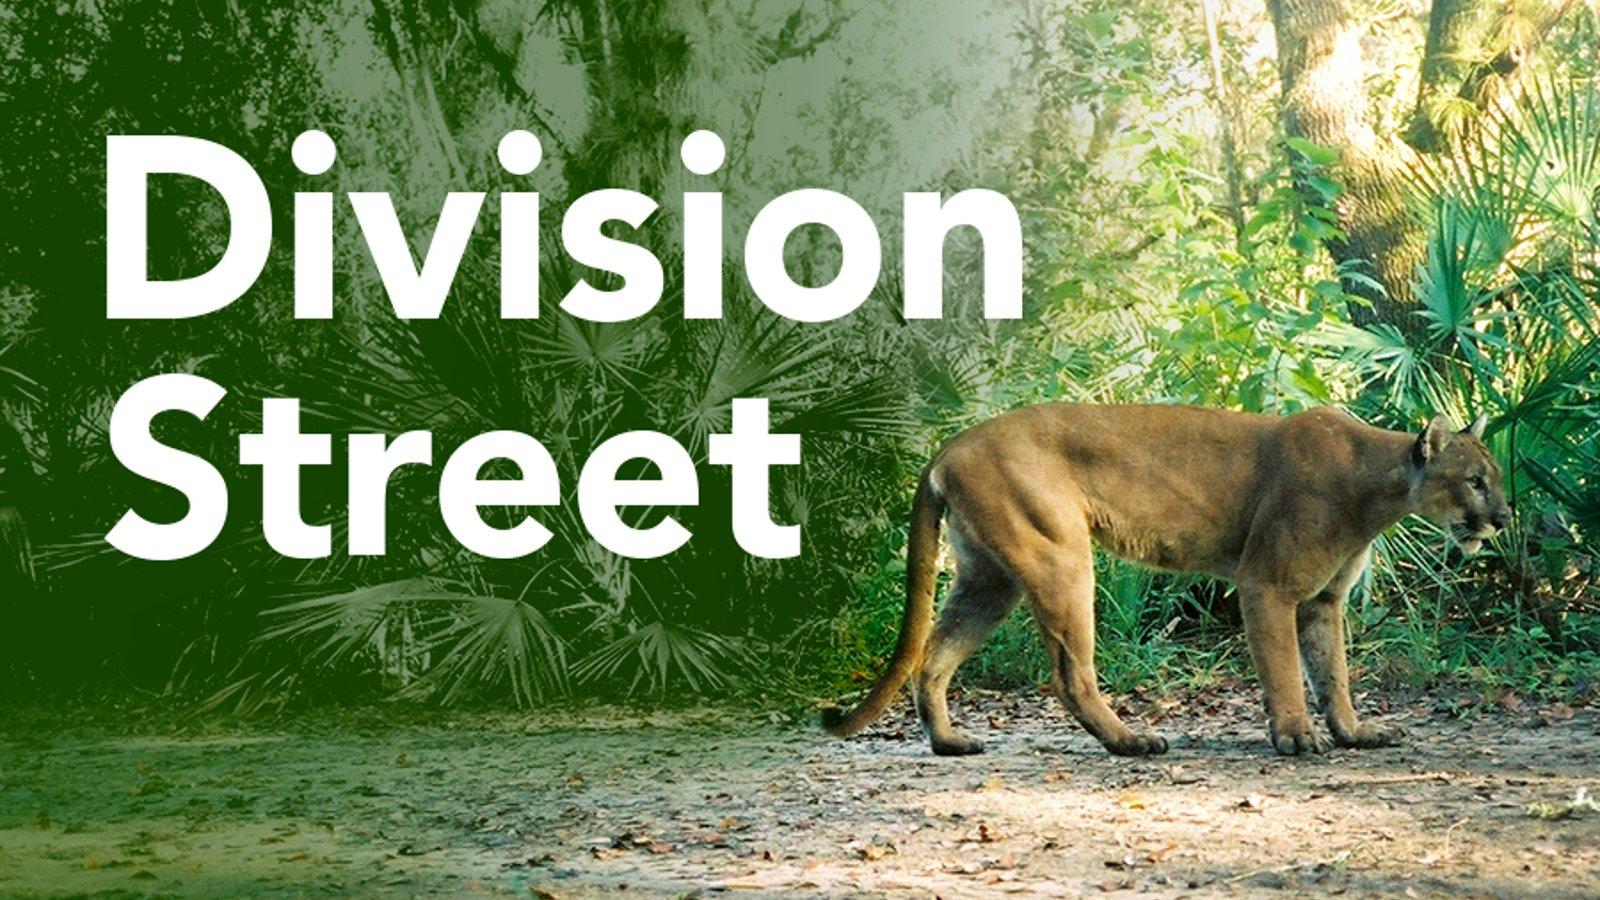 Division Street